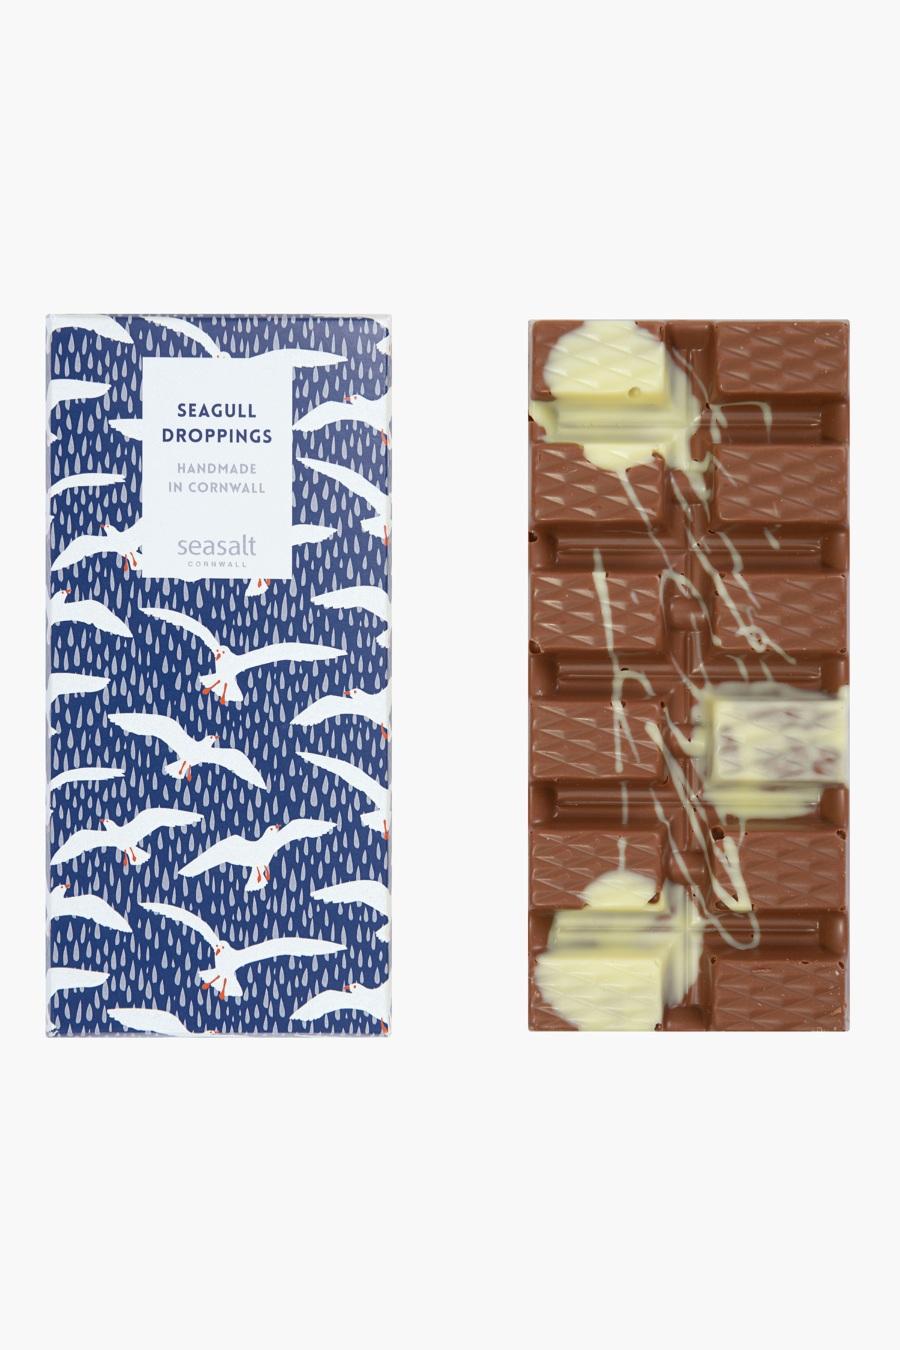 SEASALT CLOTHING - CHOCOLATE - £2.99